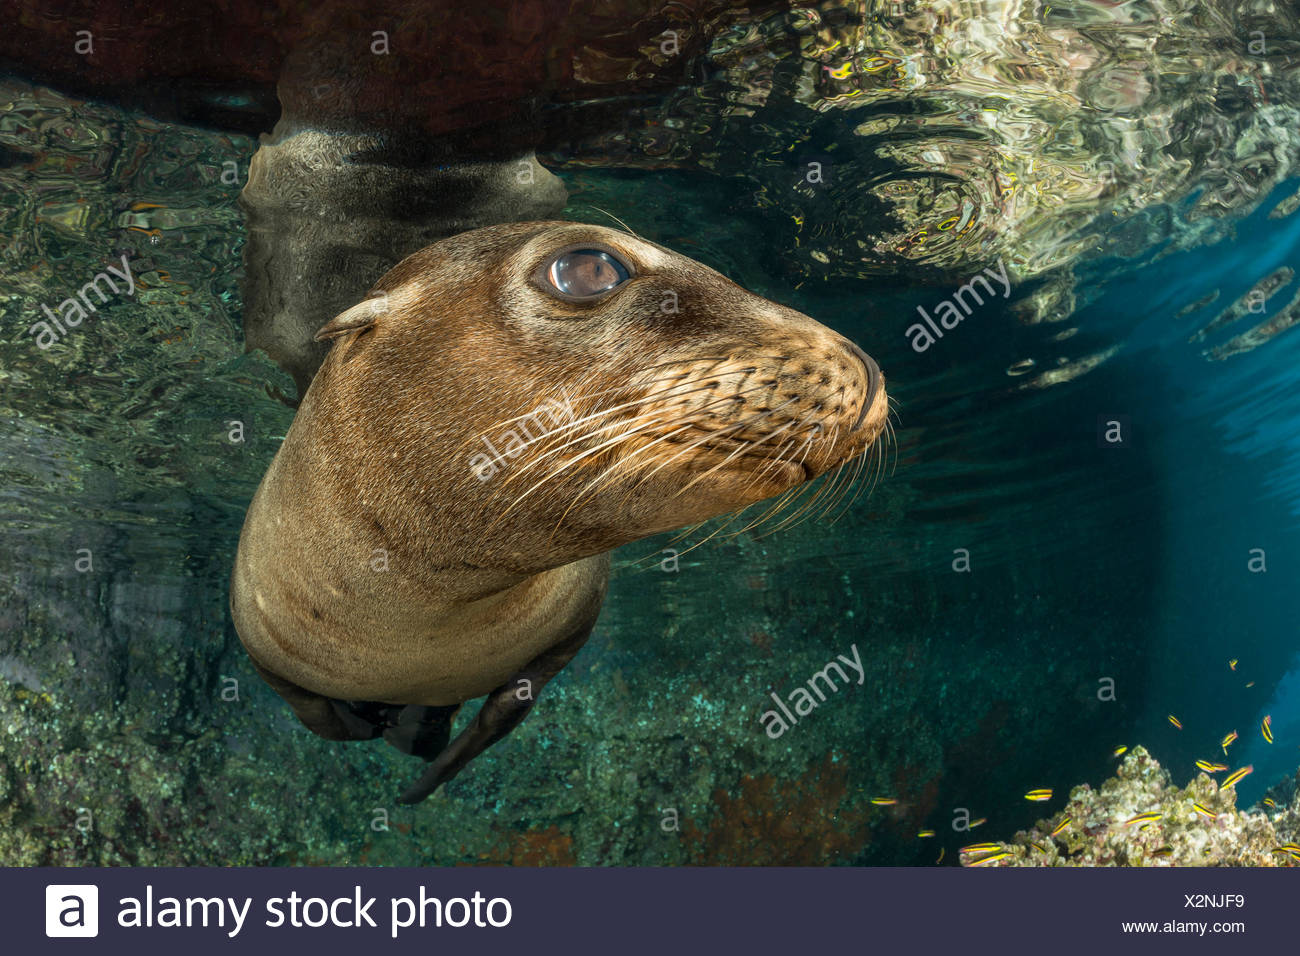 California Sea Lion, Zalophus californianus, La Paz, Baja California Sur, Mexico - Stock Image